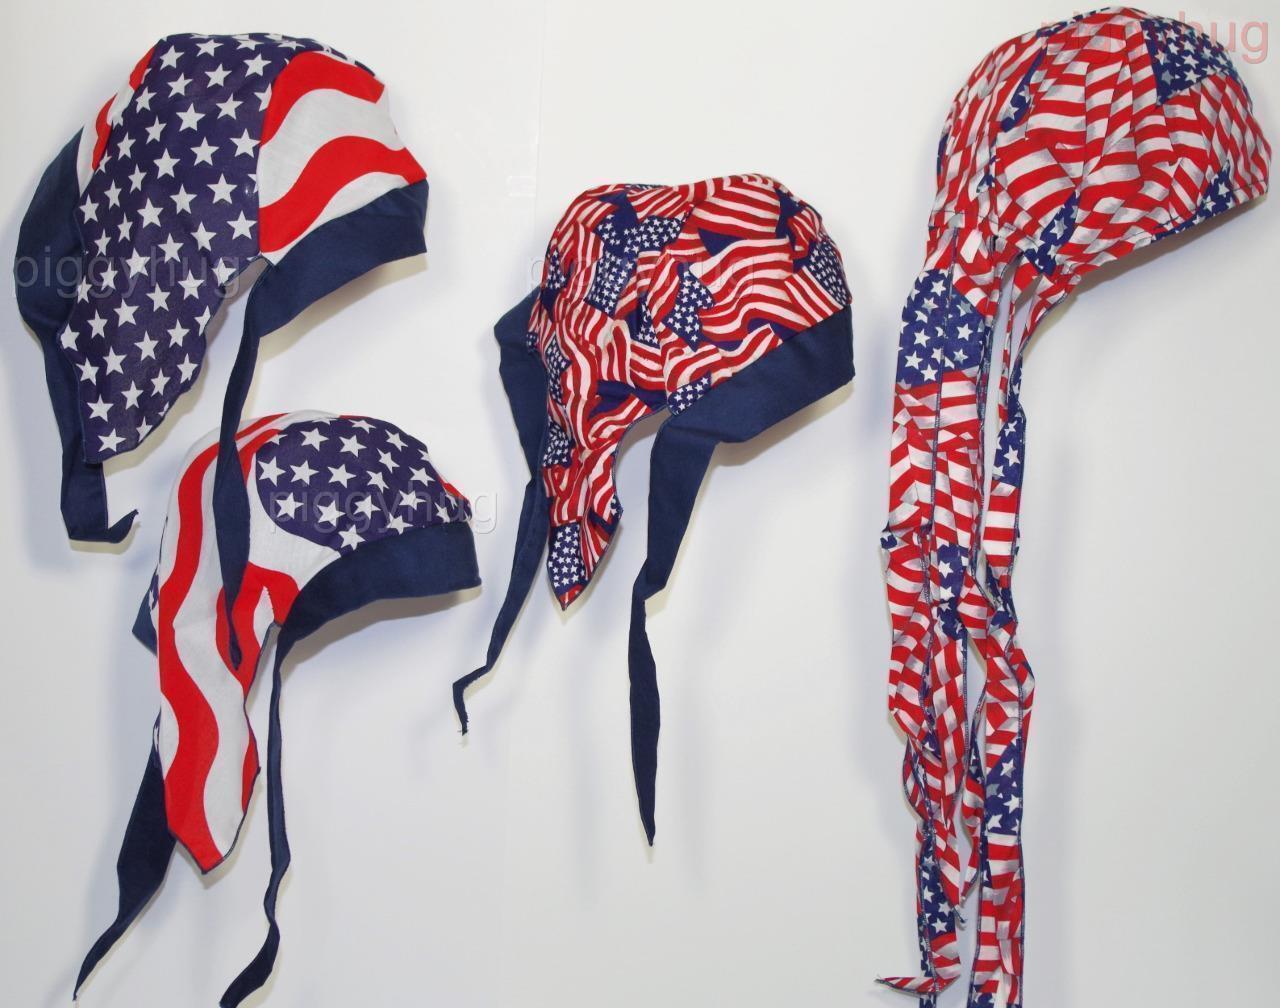 skull cap rag hat do du doo rag cap  American USA flag sweat band  USA made long tail a7c864